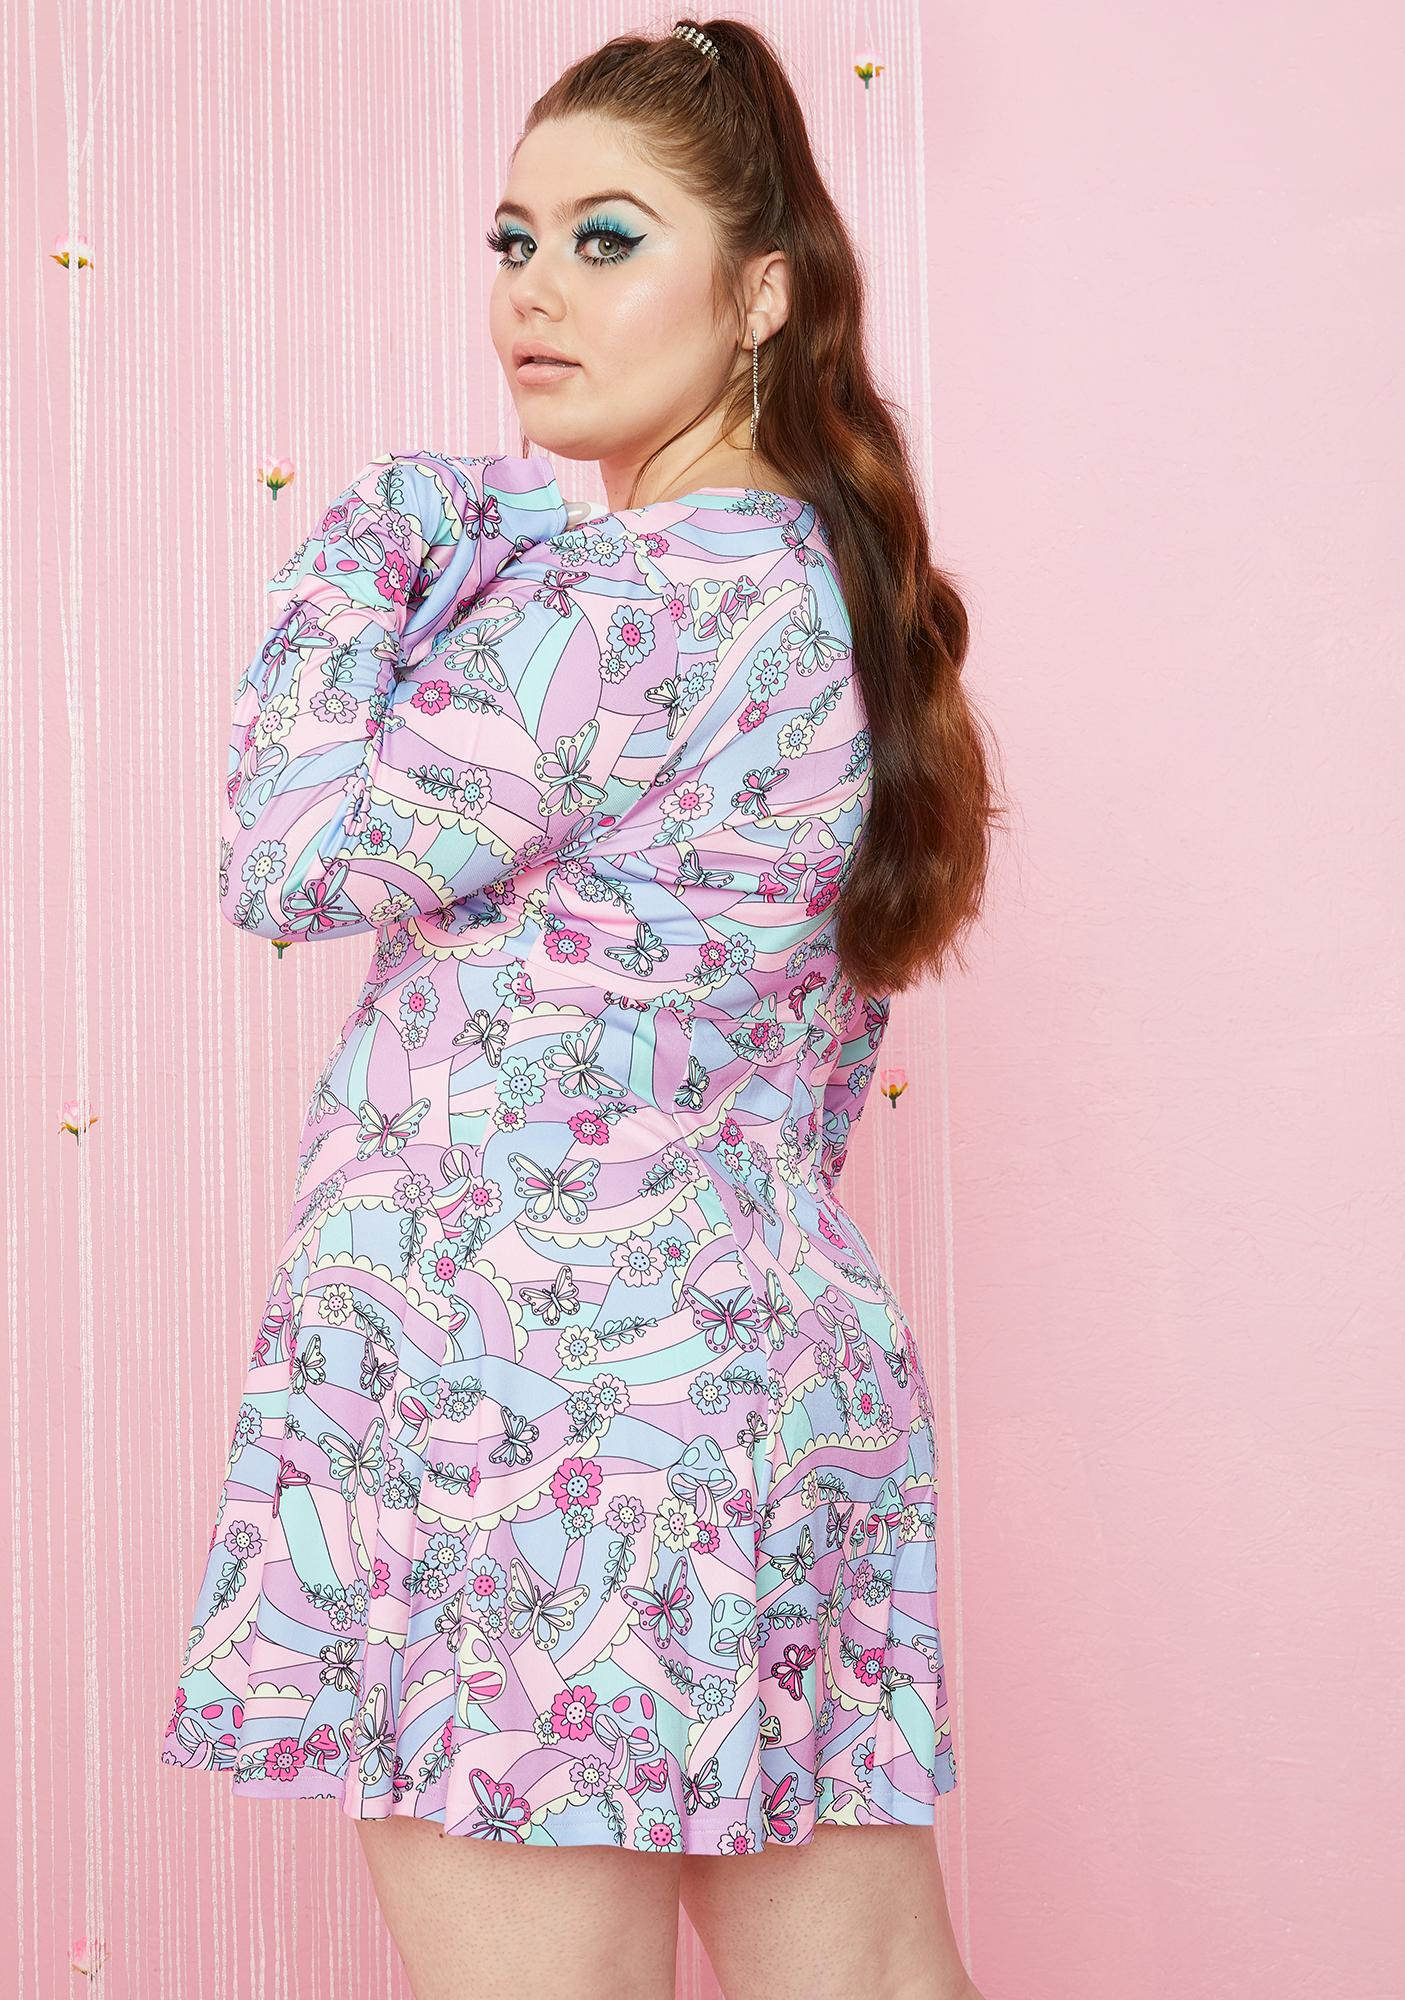 Sugar Thrillz Always Blooming With Love Mini Dress